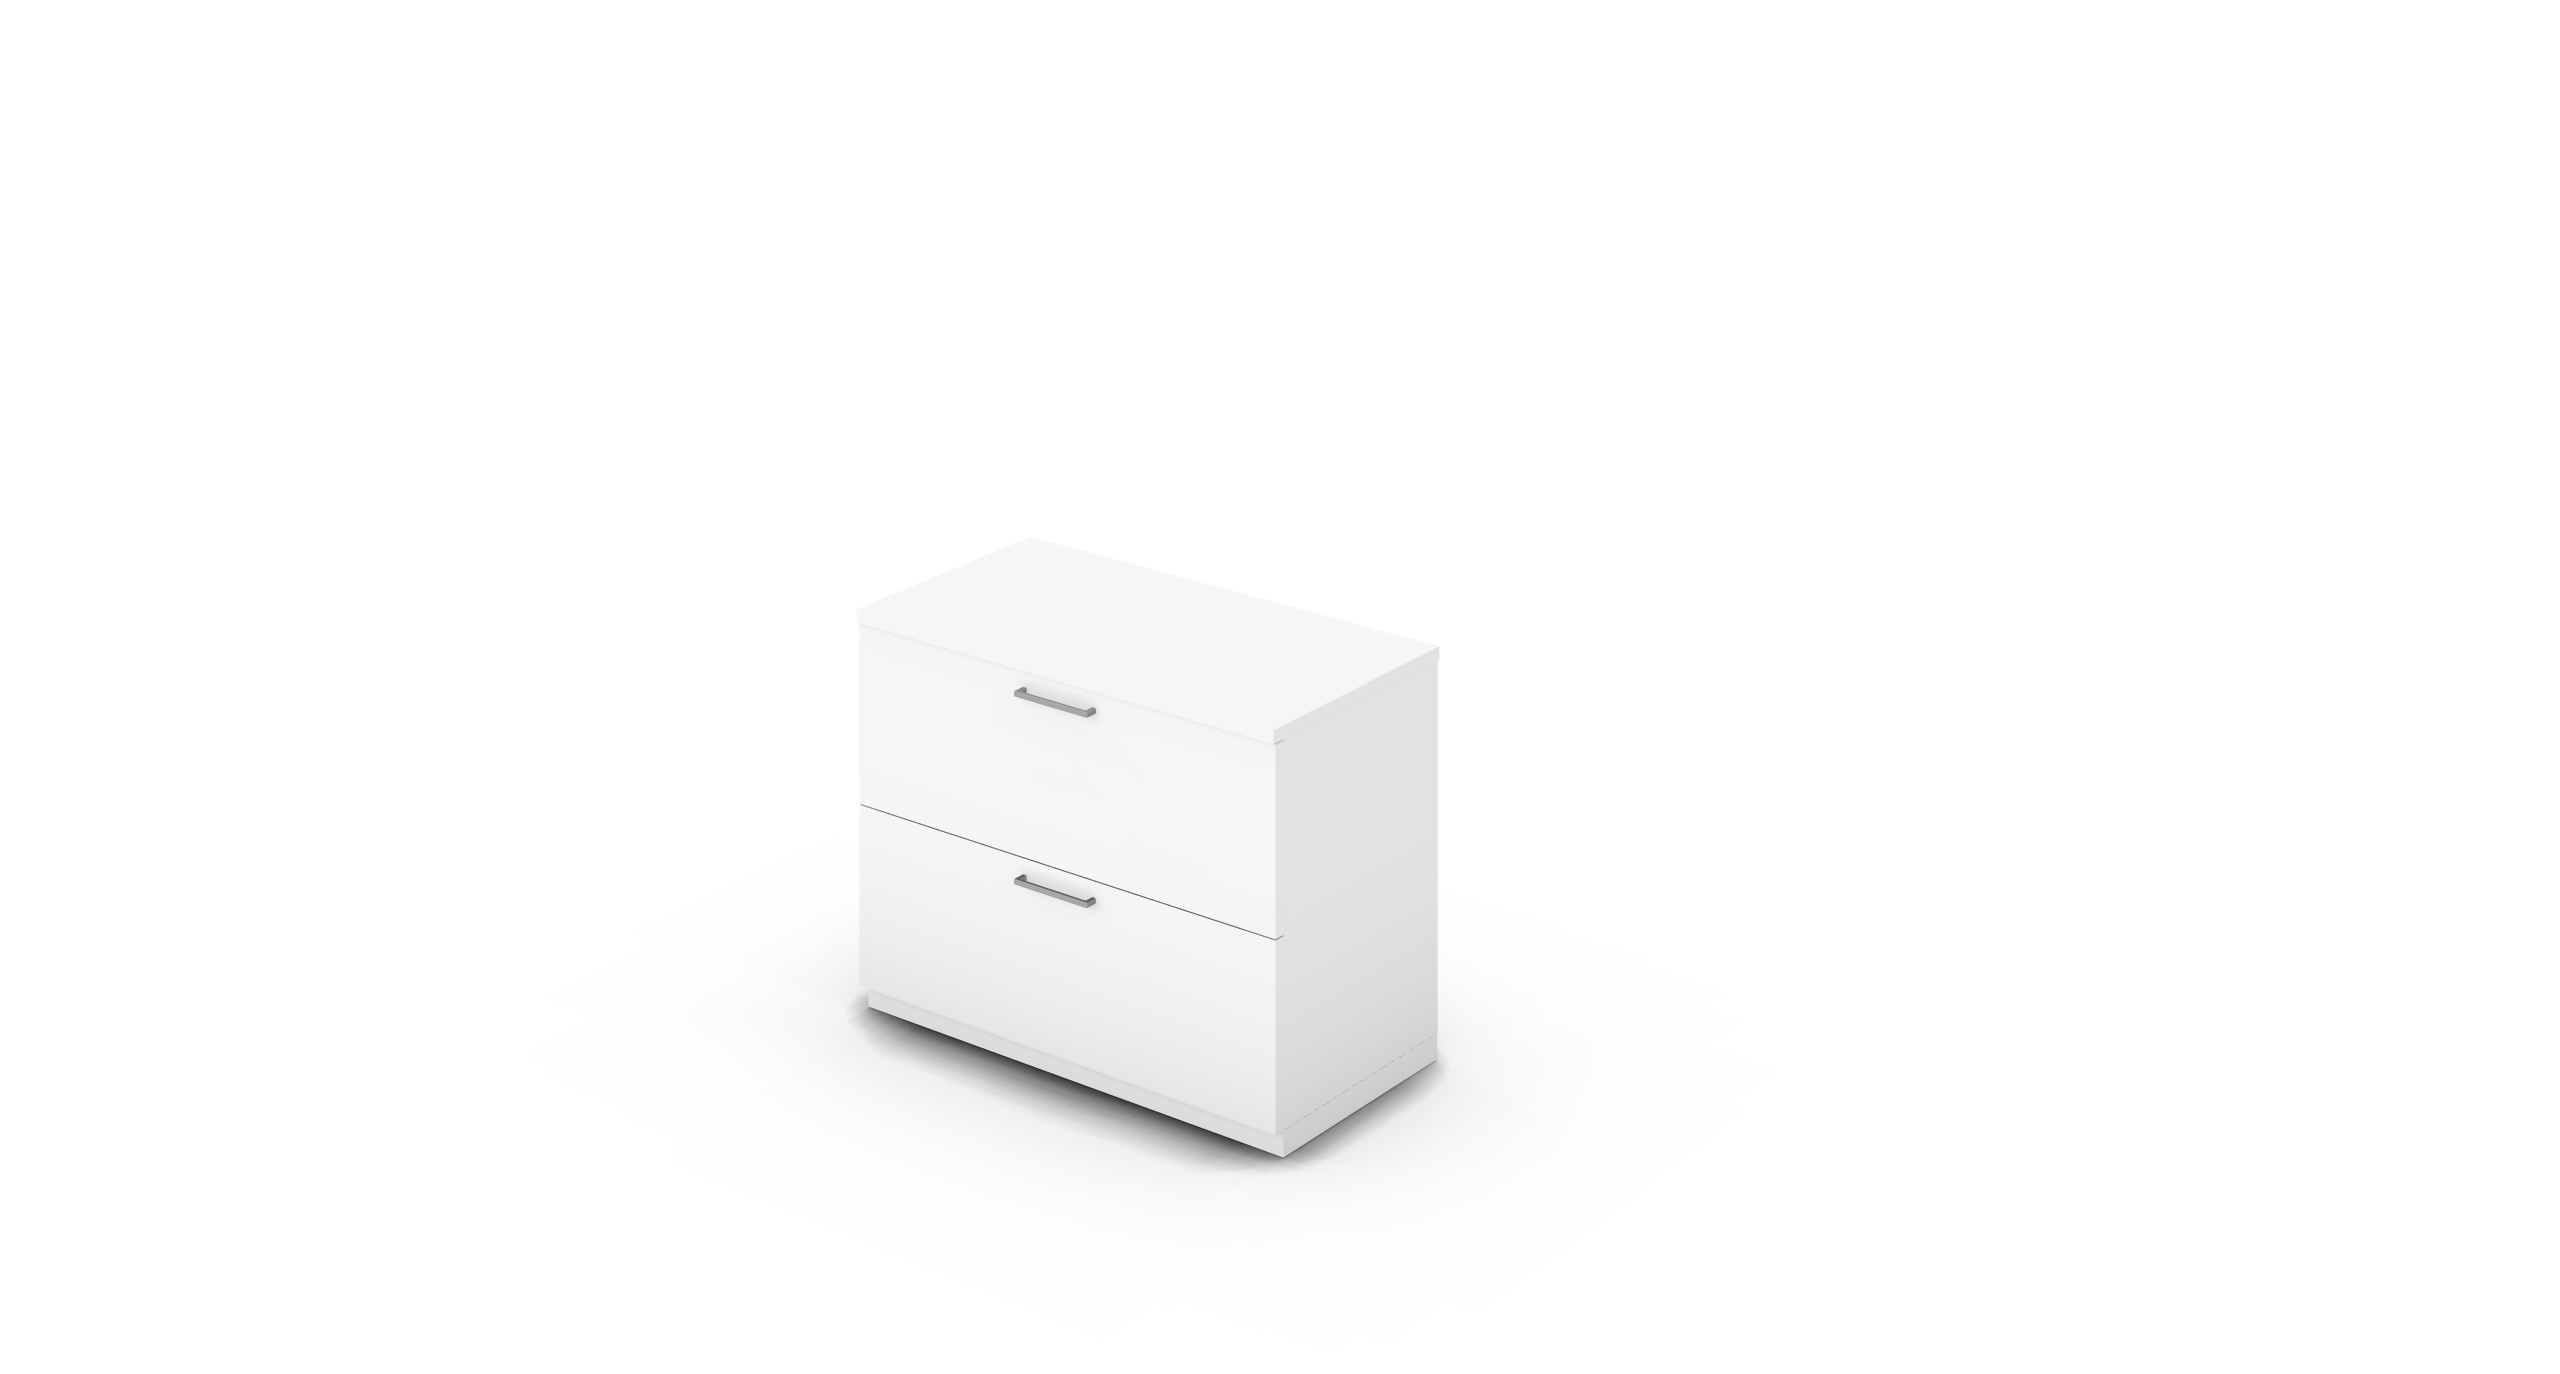 Cabinet_900x450x775_DR_White_Bar_Square_NoCylinder